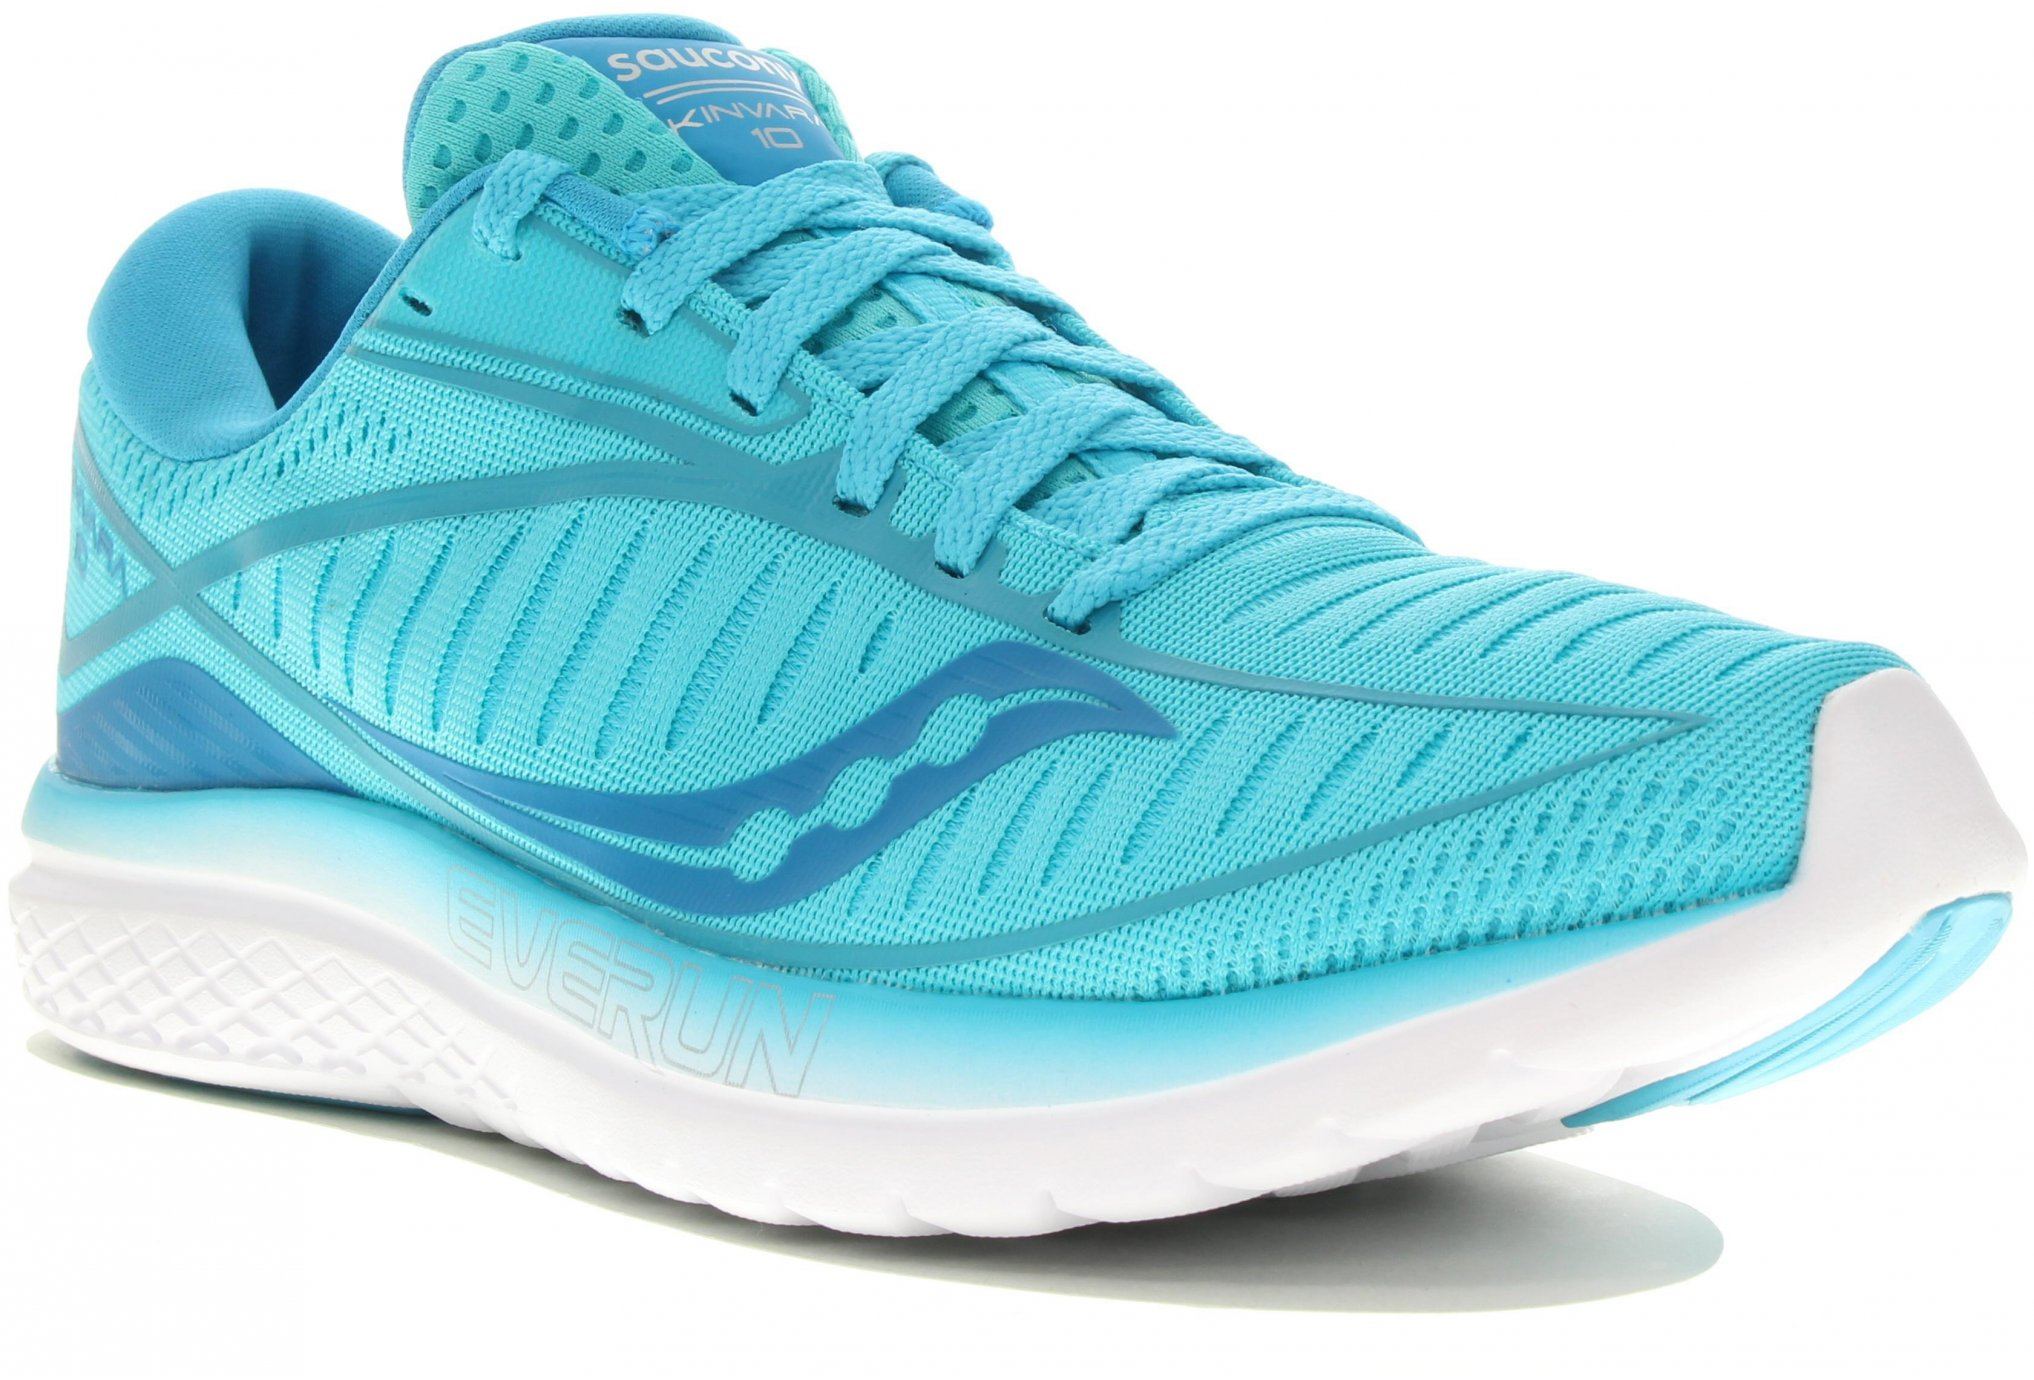 Saucony Kinvara 10 Chaussures running femme